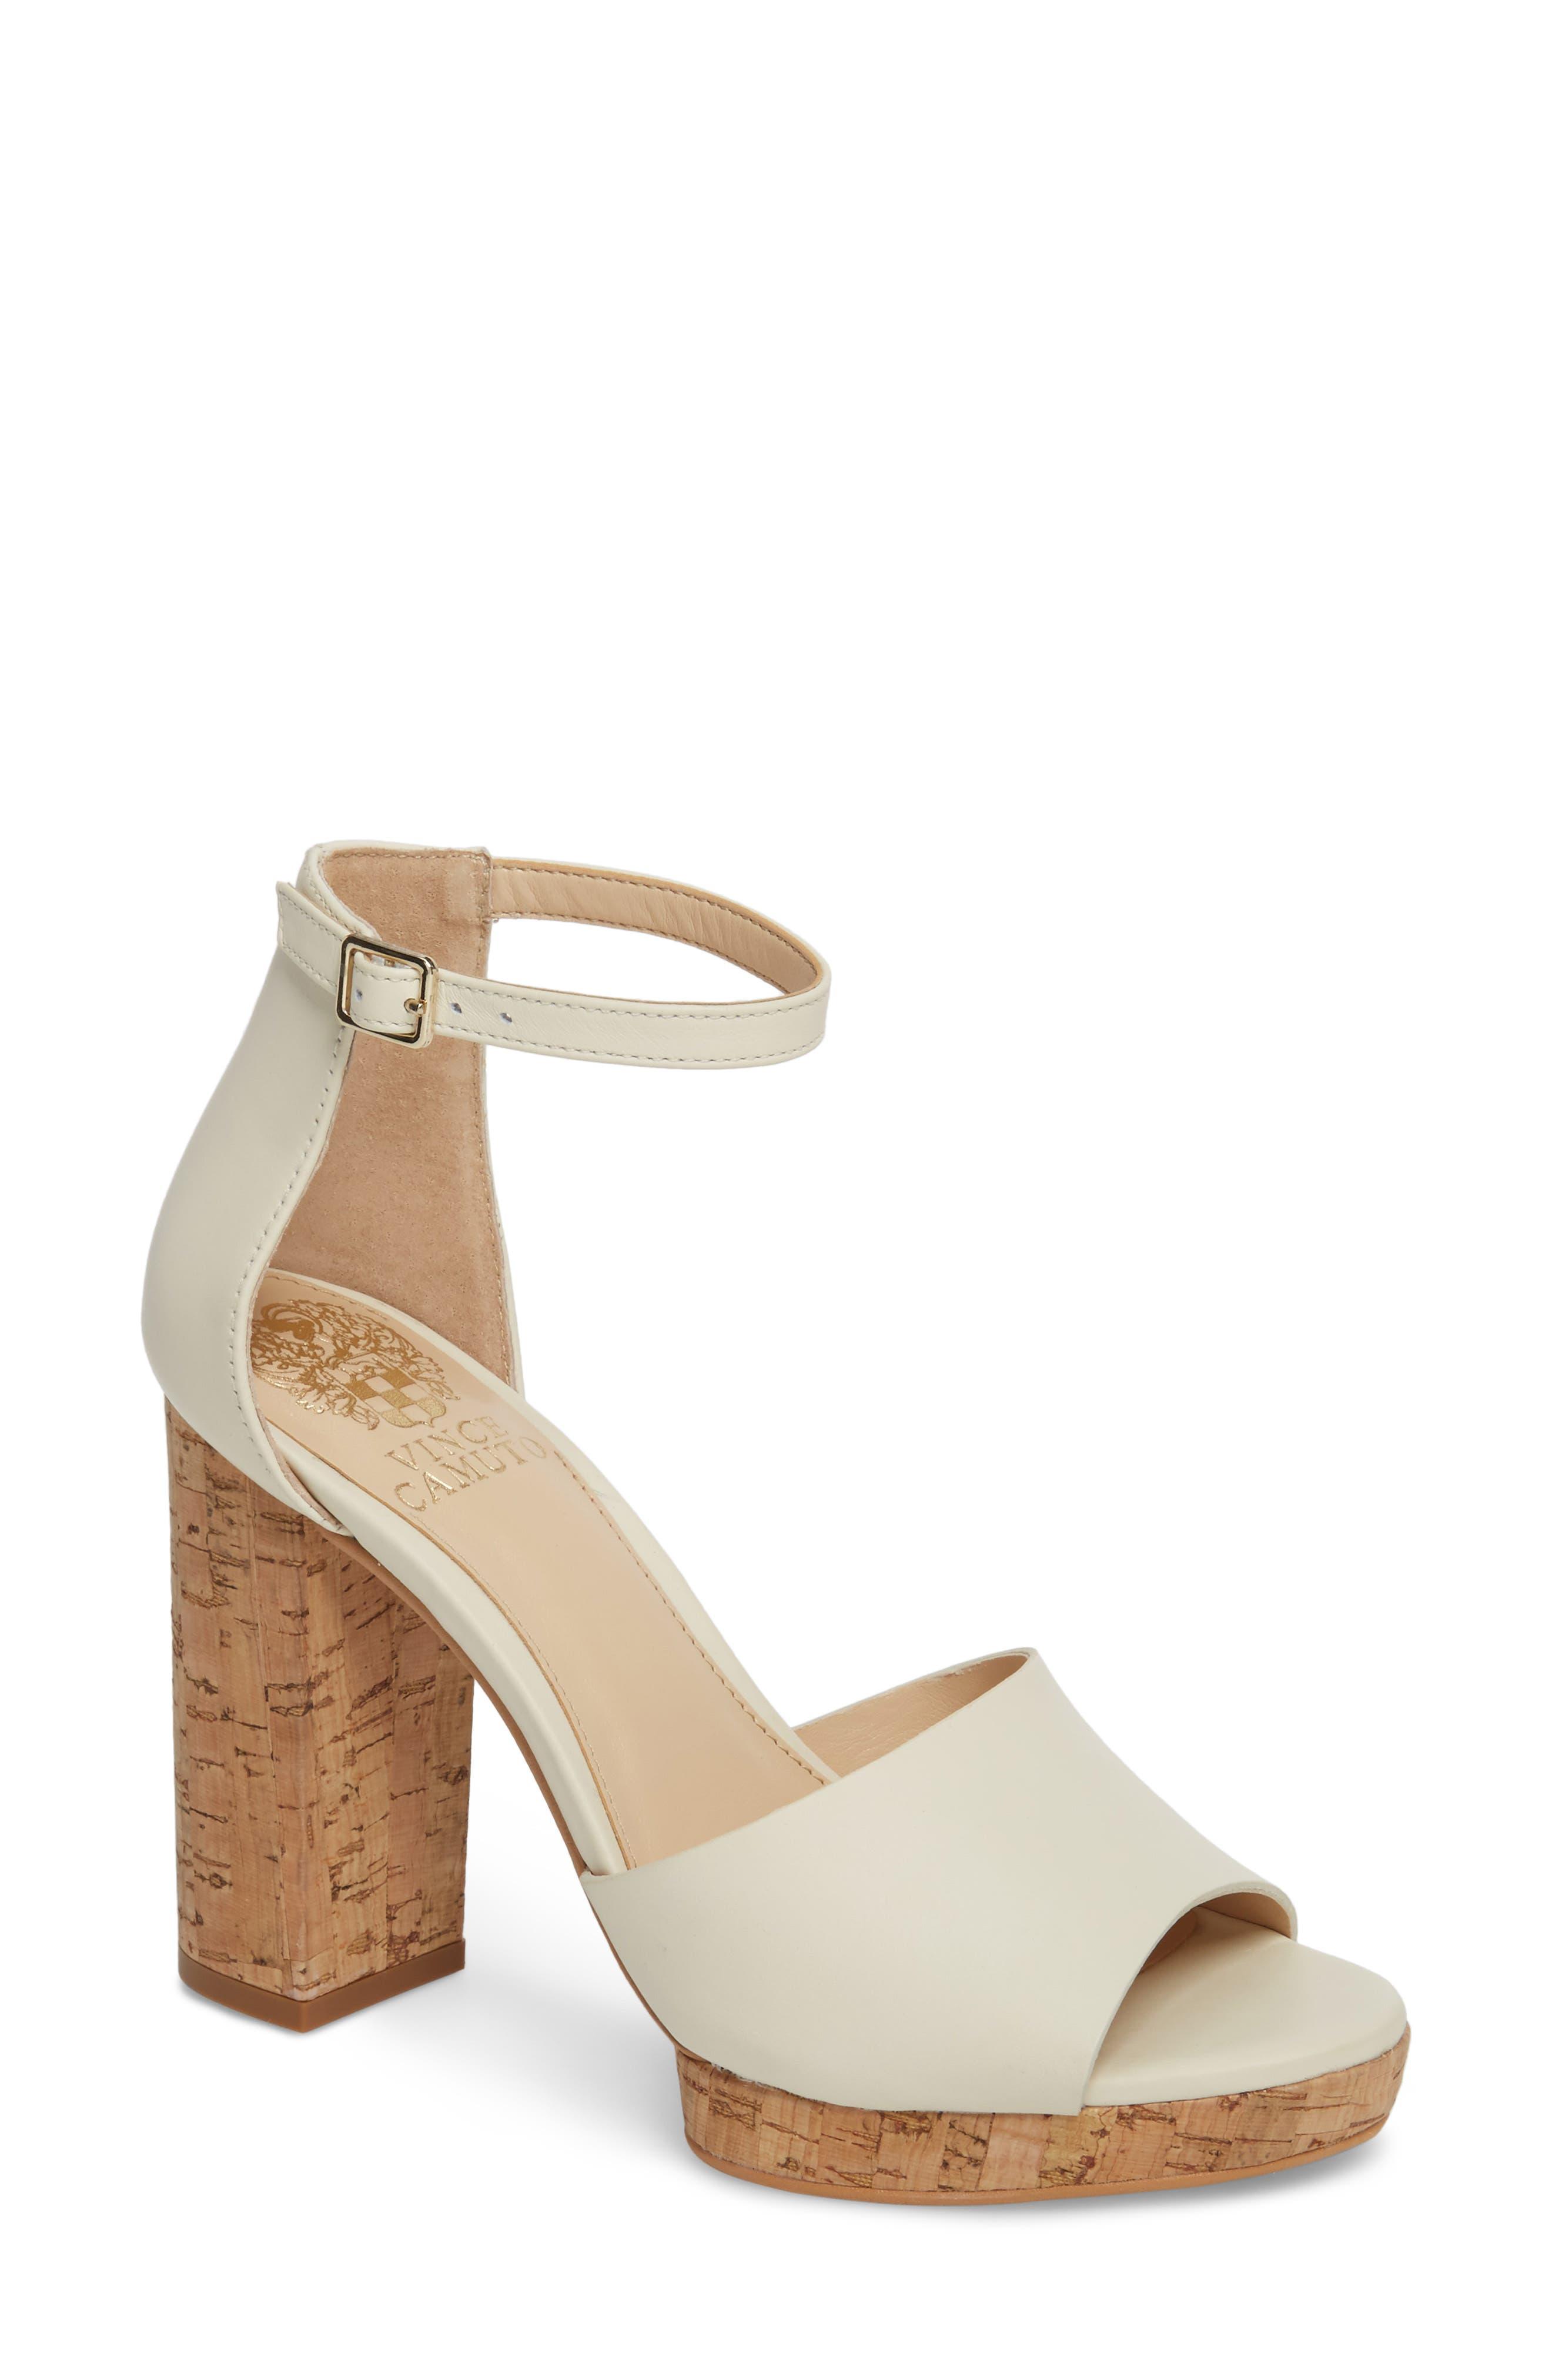 Ciestie Platform Sandal,                         Main,                         color, Vanilla Leather